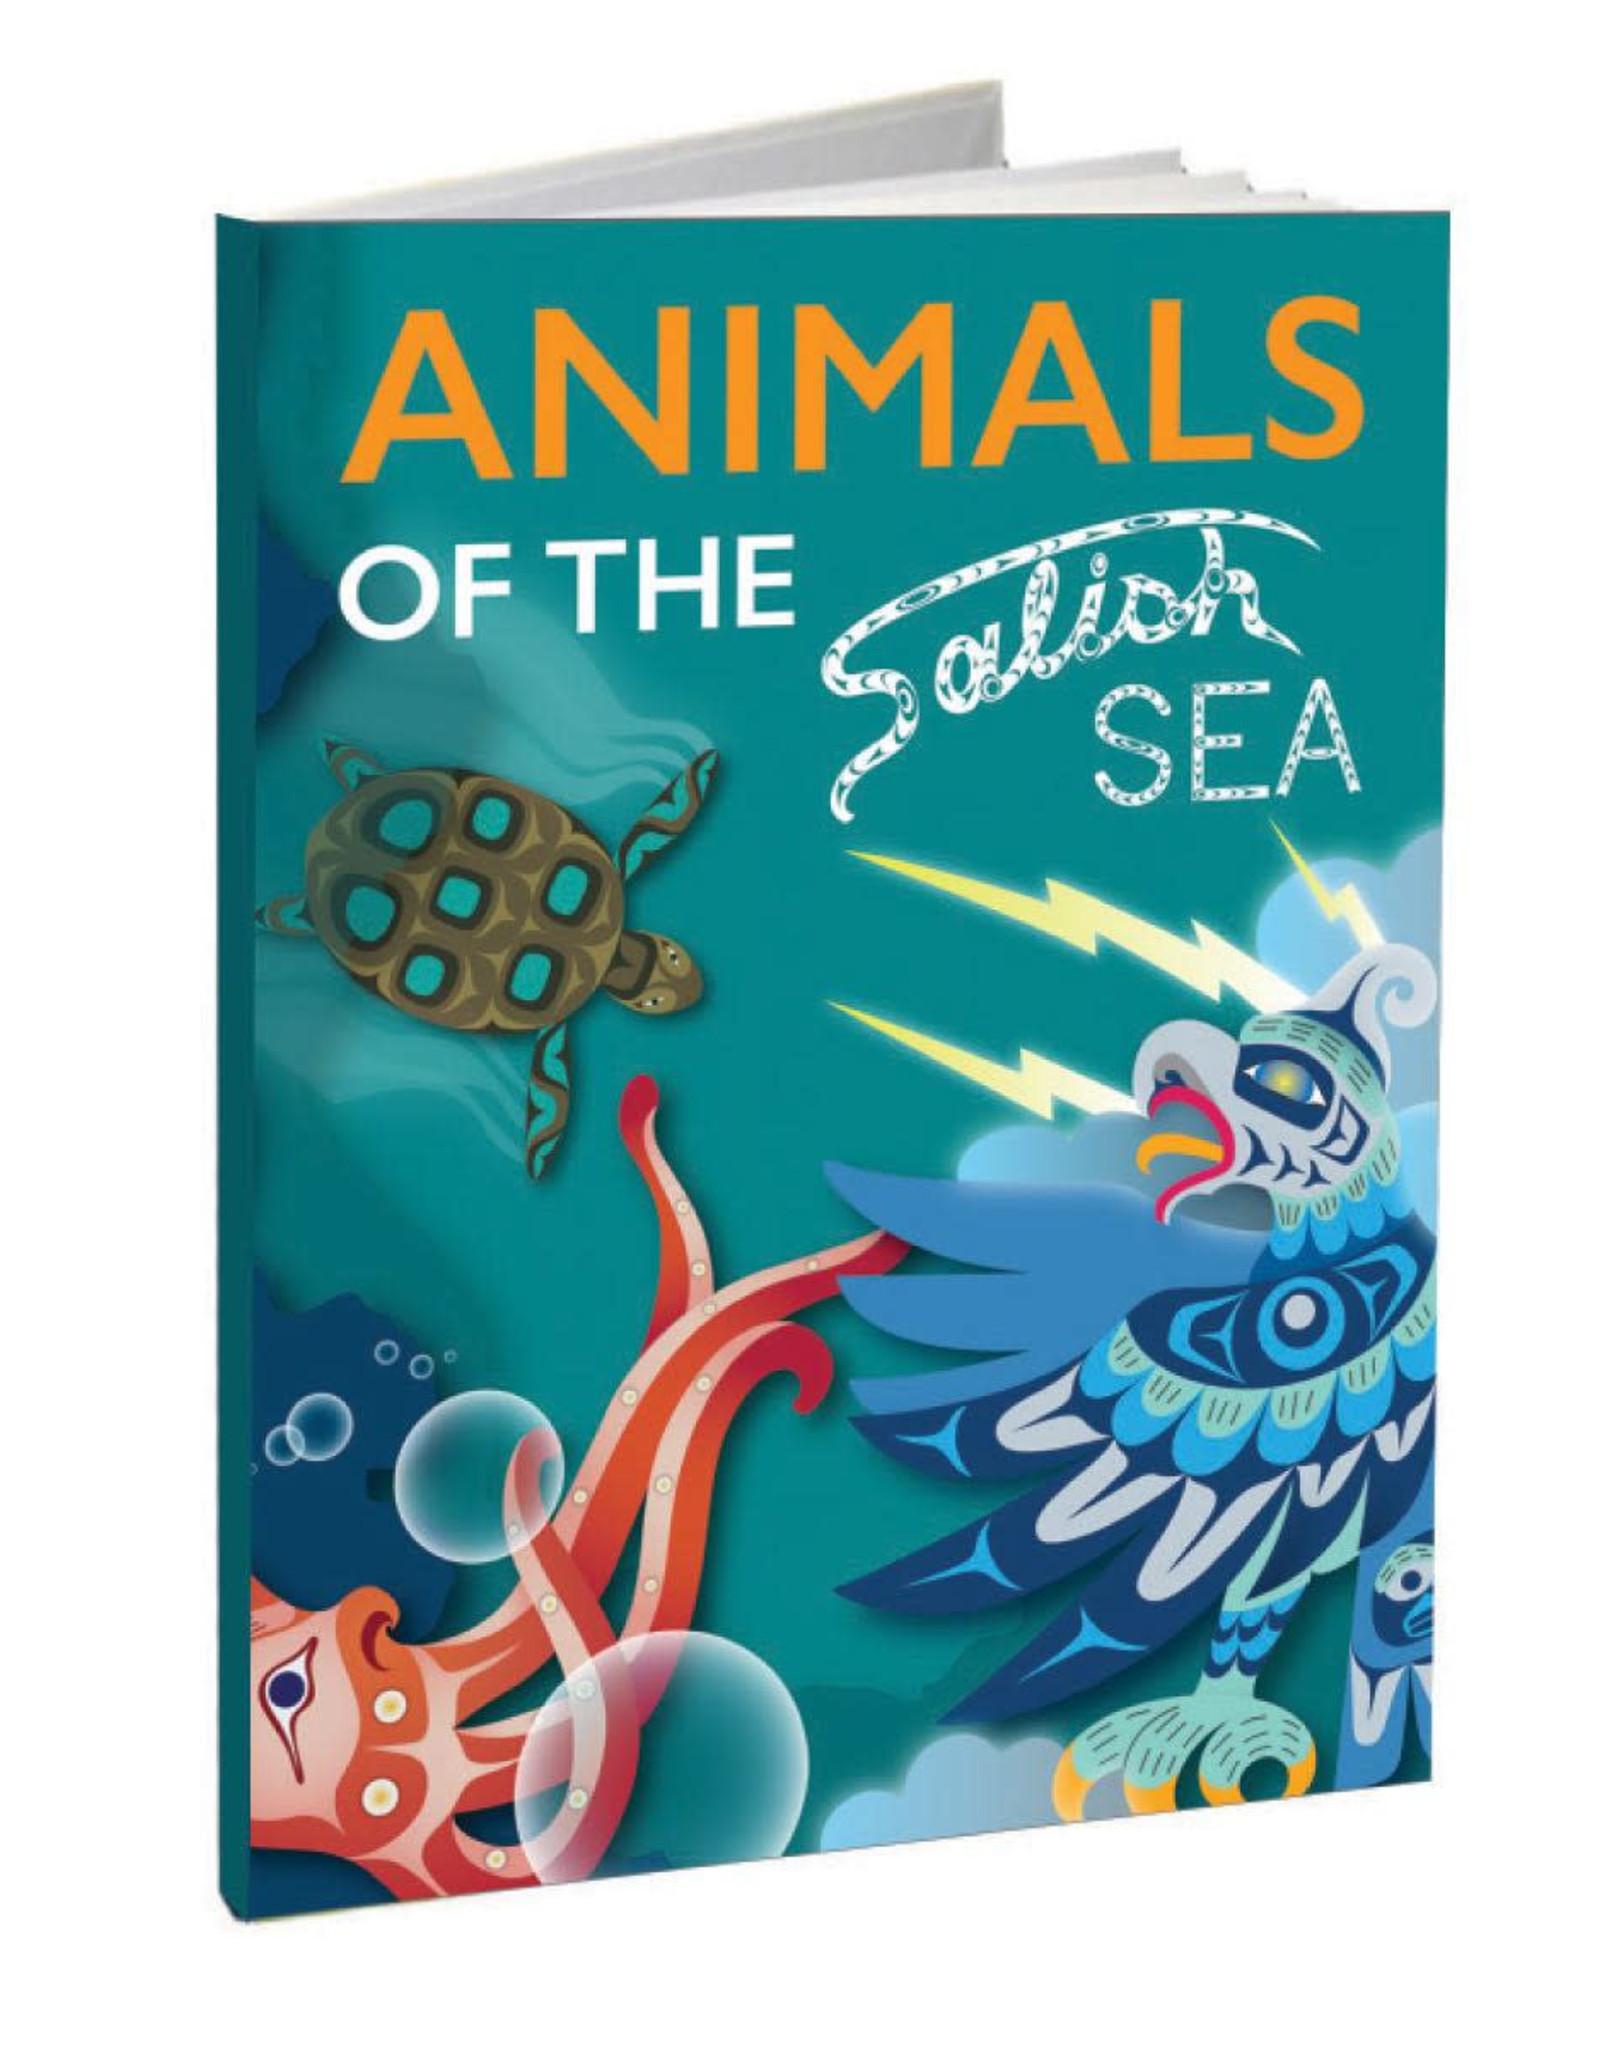 Animals of the Salish Sea -Hard Cover